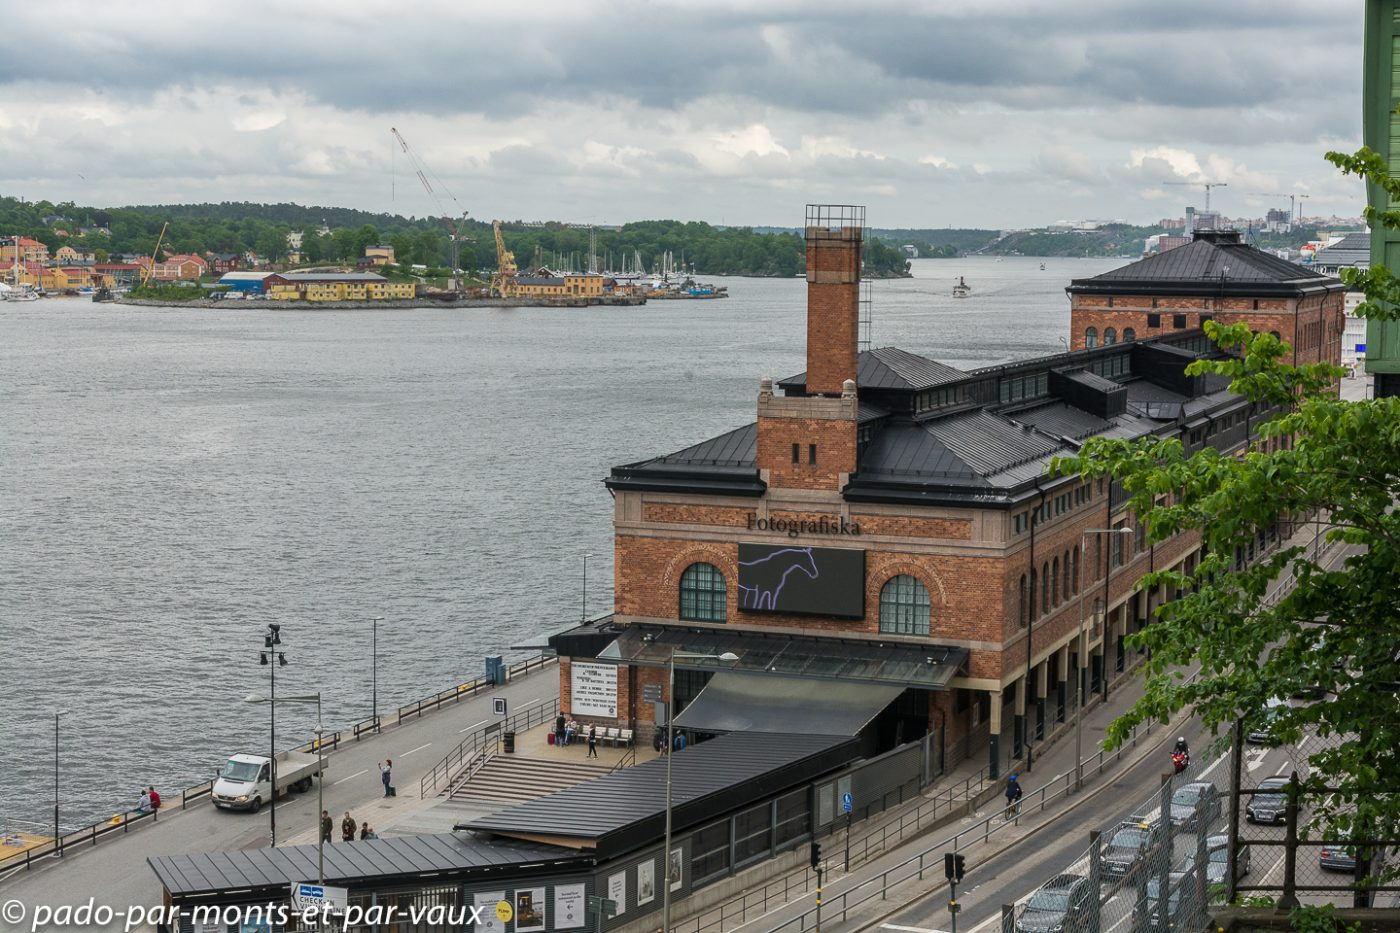 Stockholm - Fotografiska